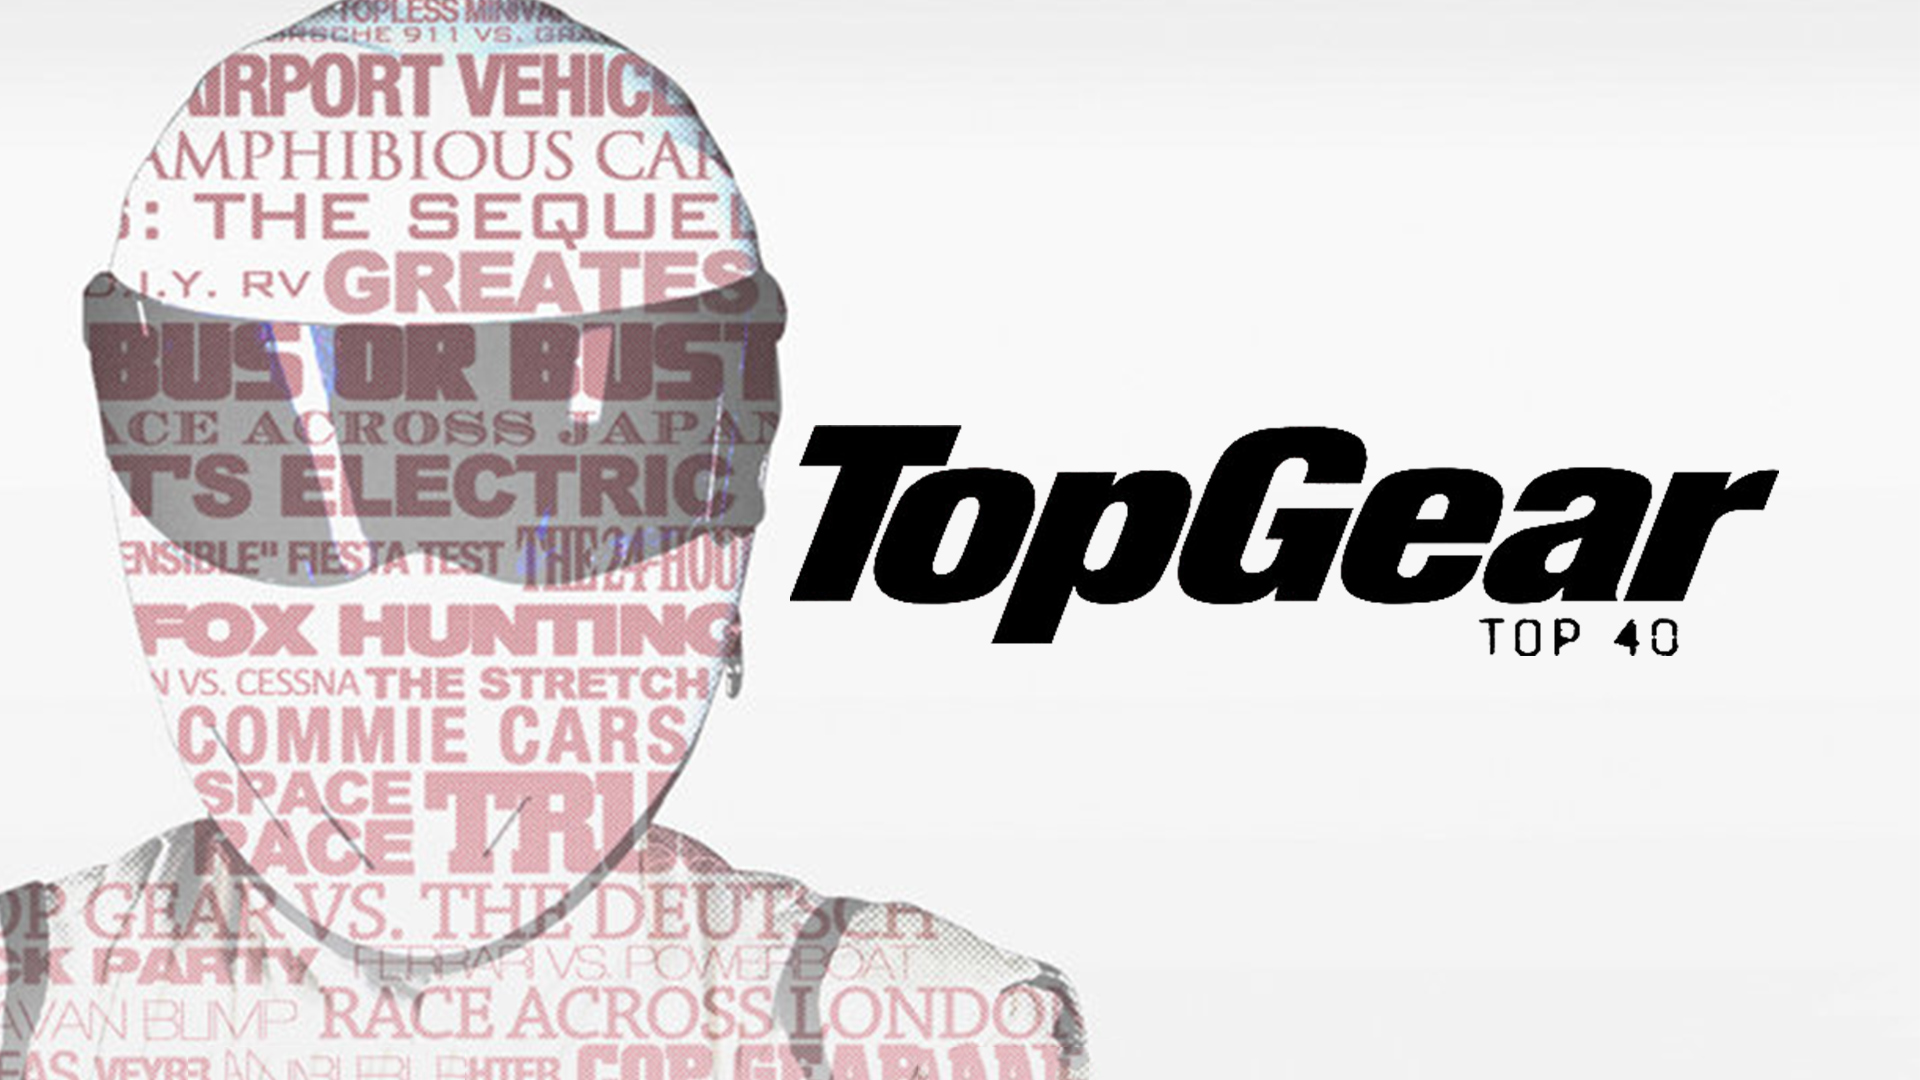 Top Gear Top 40 Season 1